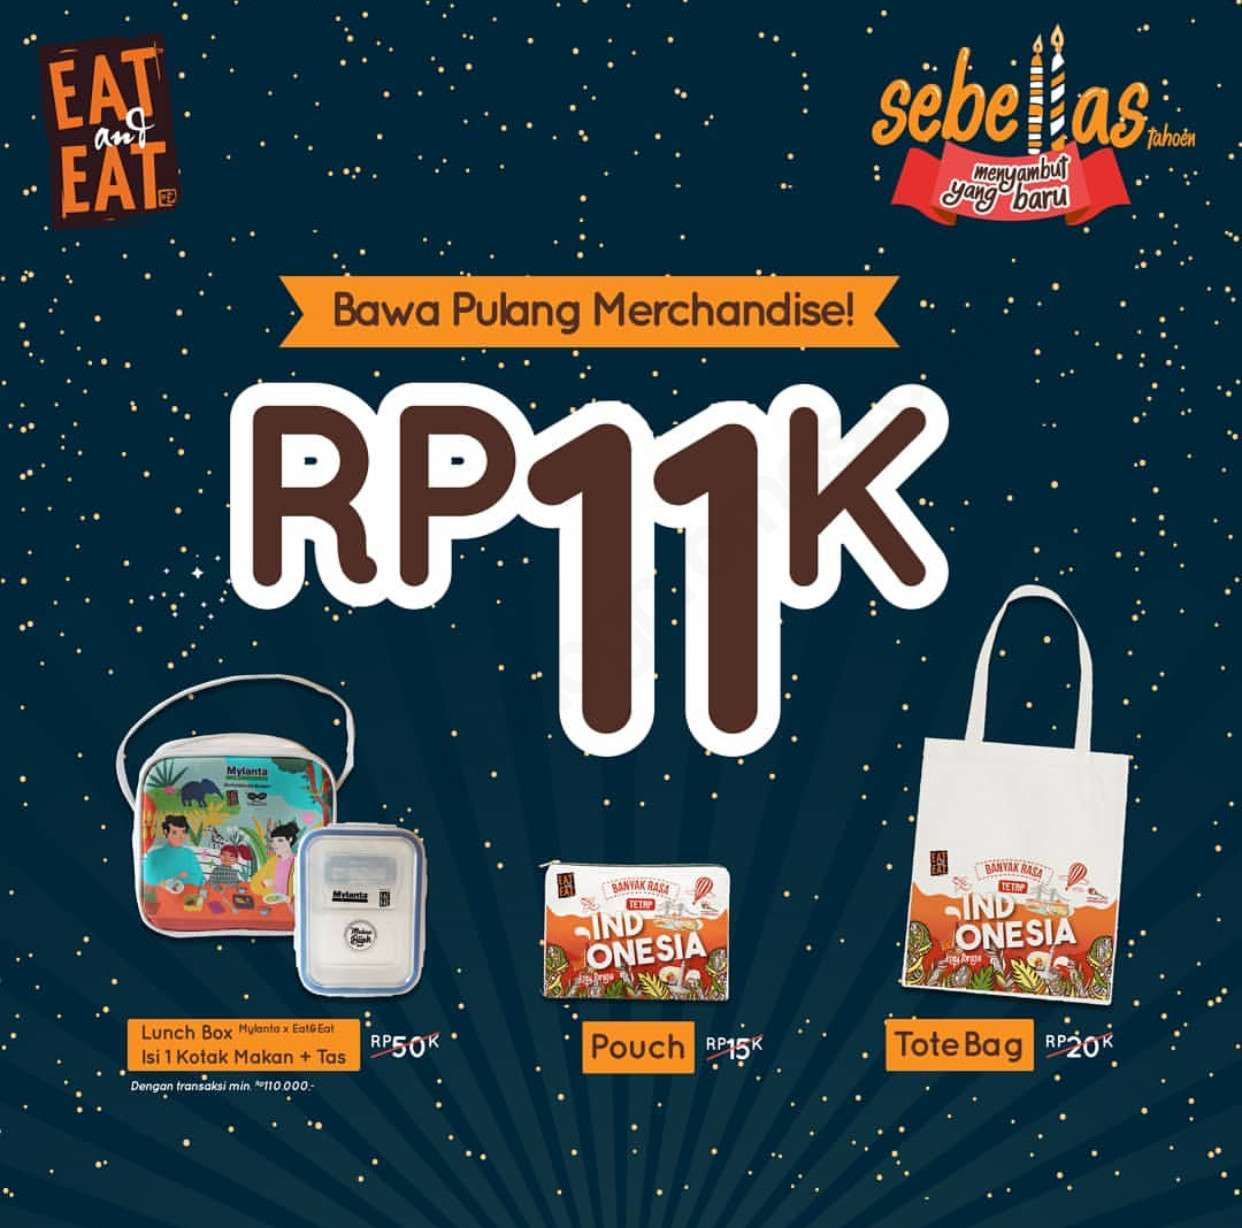 Eat and Eat Promo Merchandise cuma Rp. 11.000